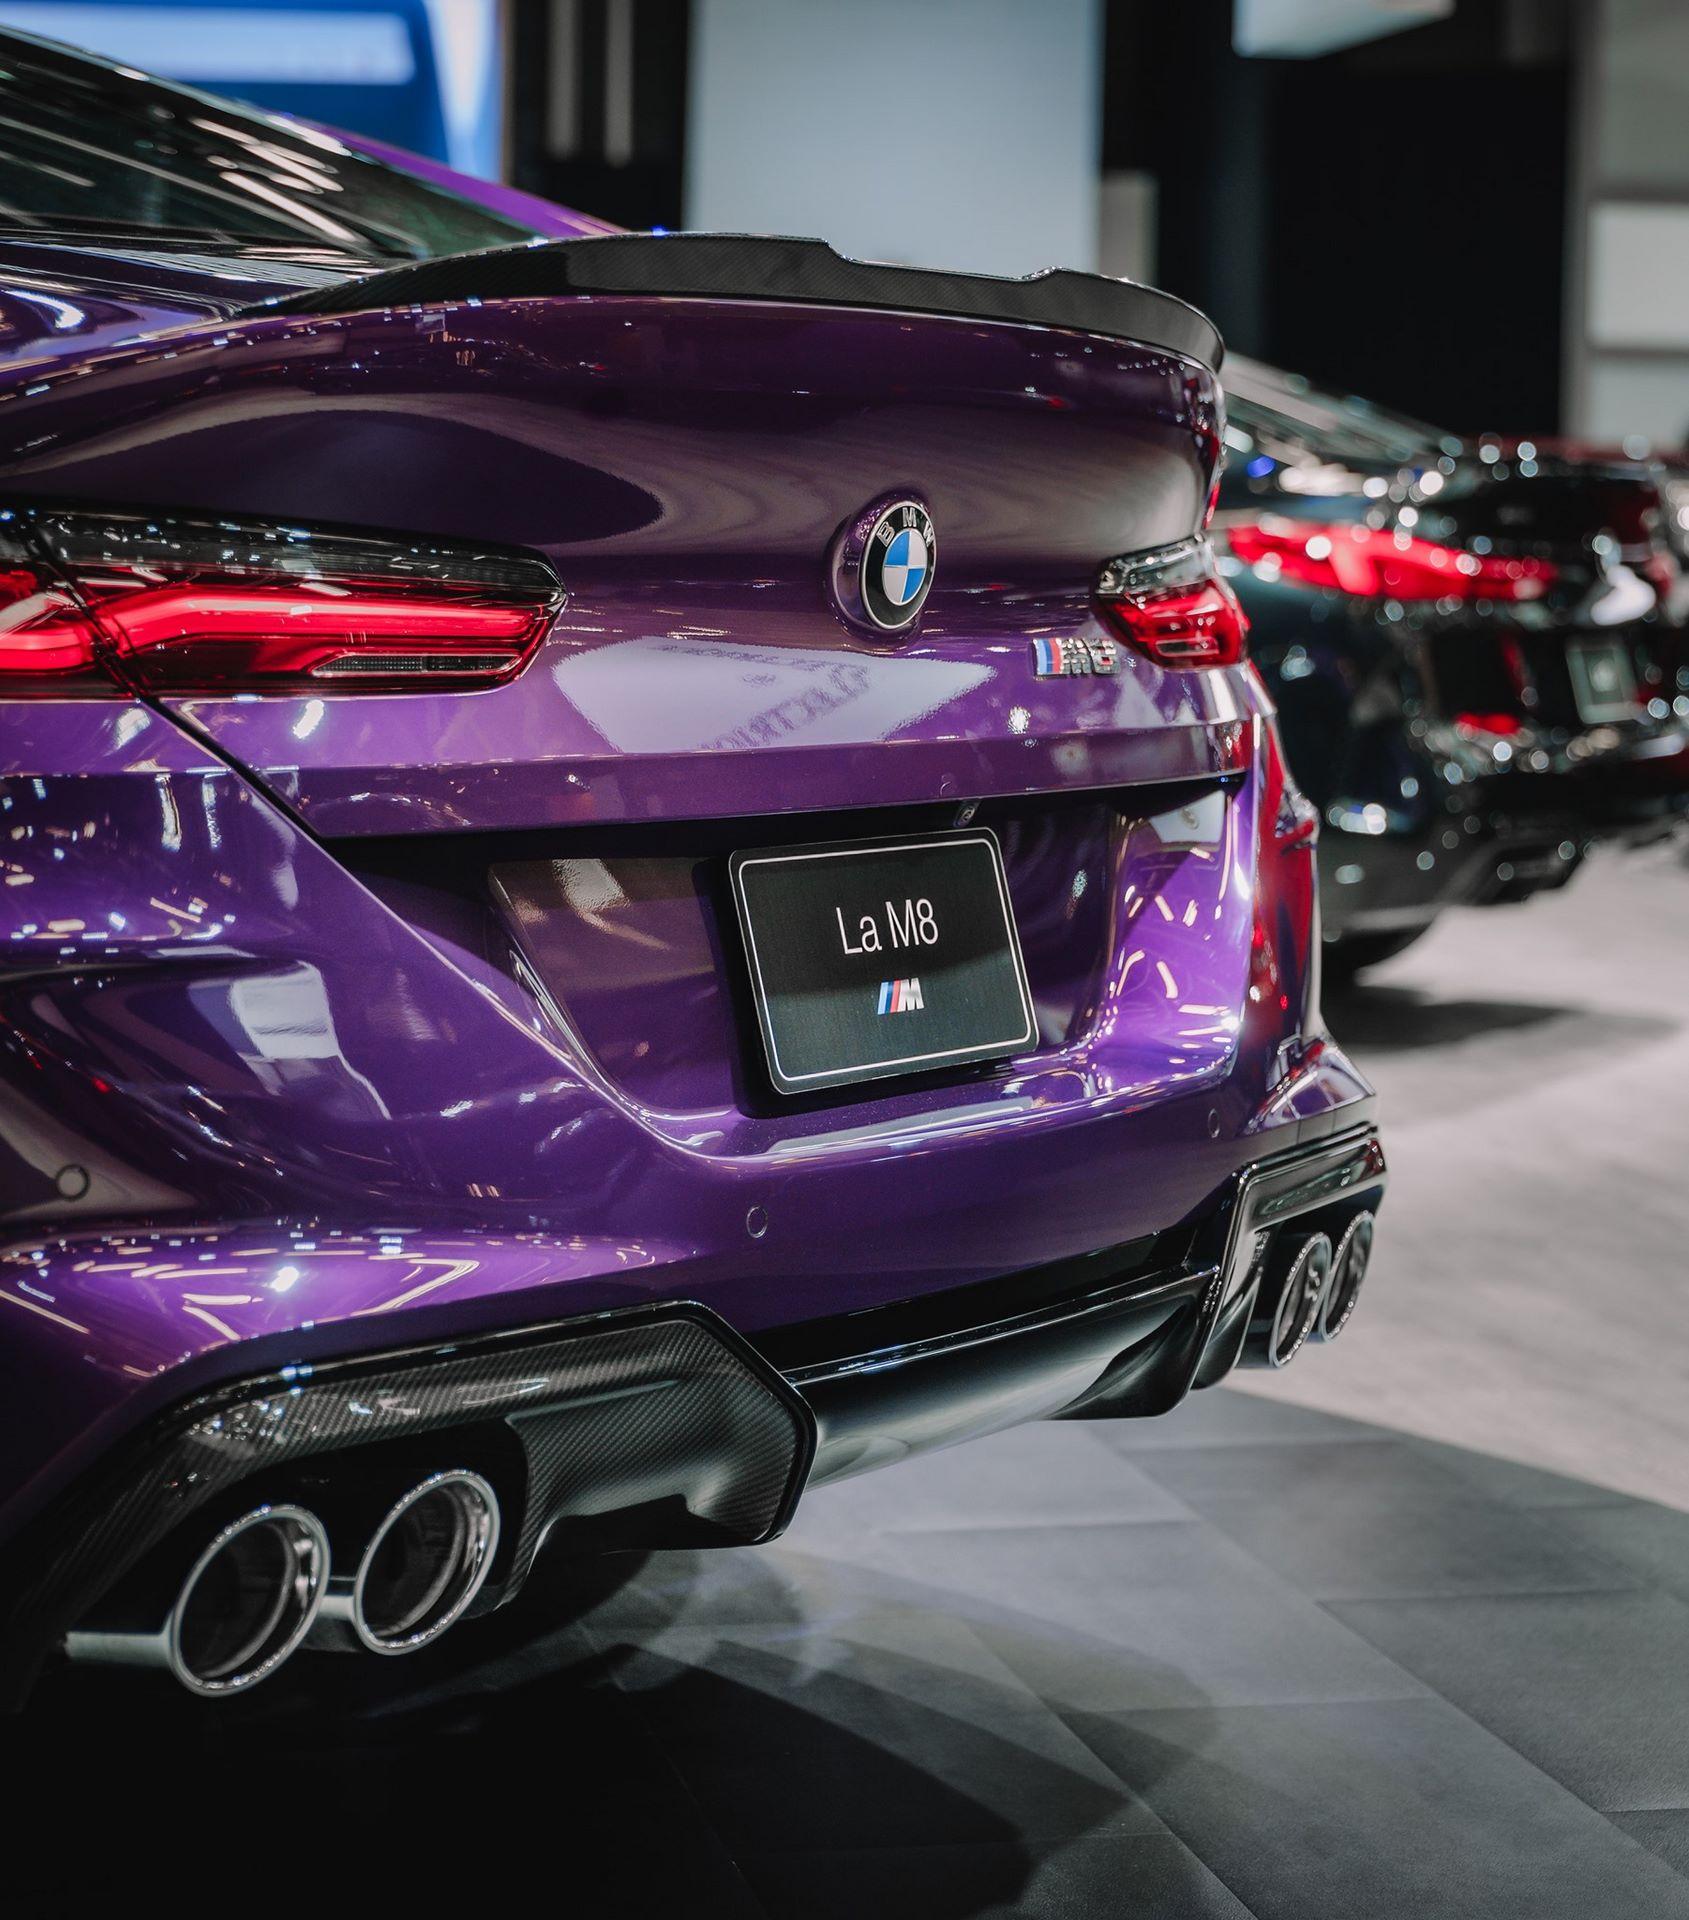 BMW-M8-Gran-Coupe-Twilight-Purple-2